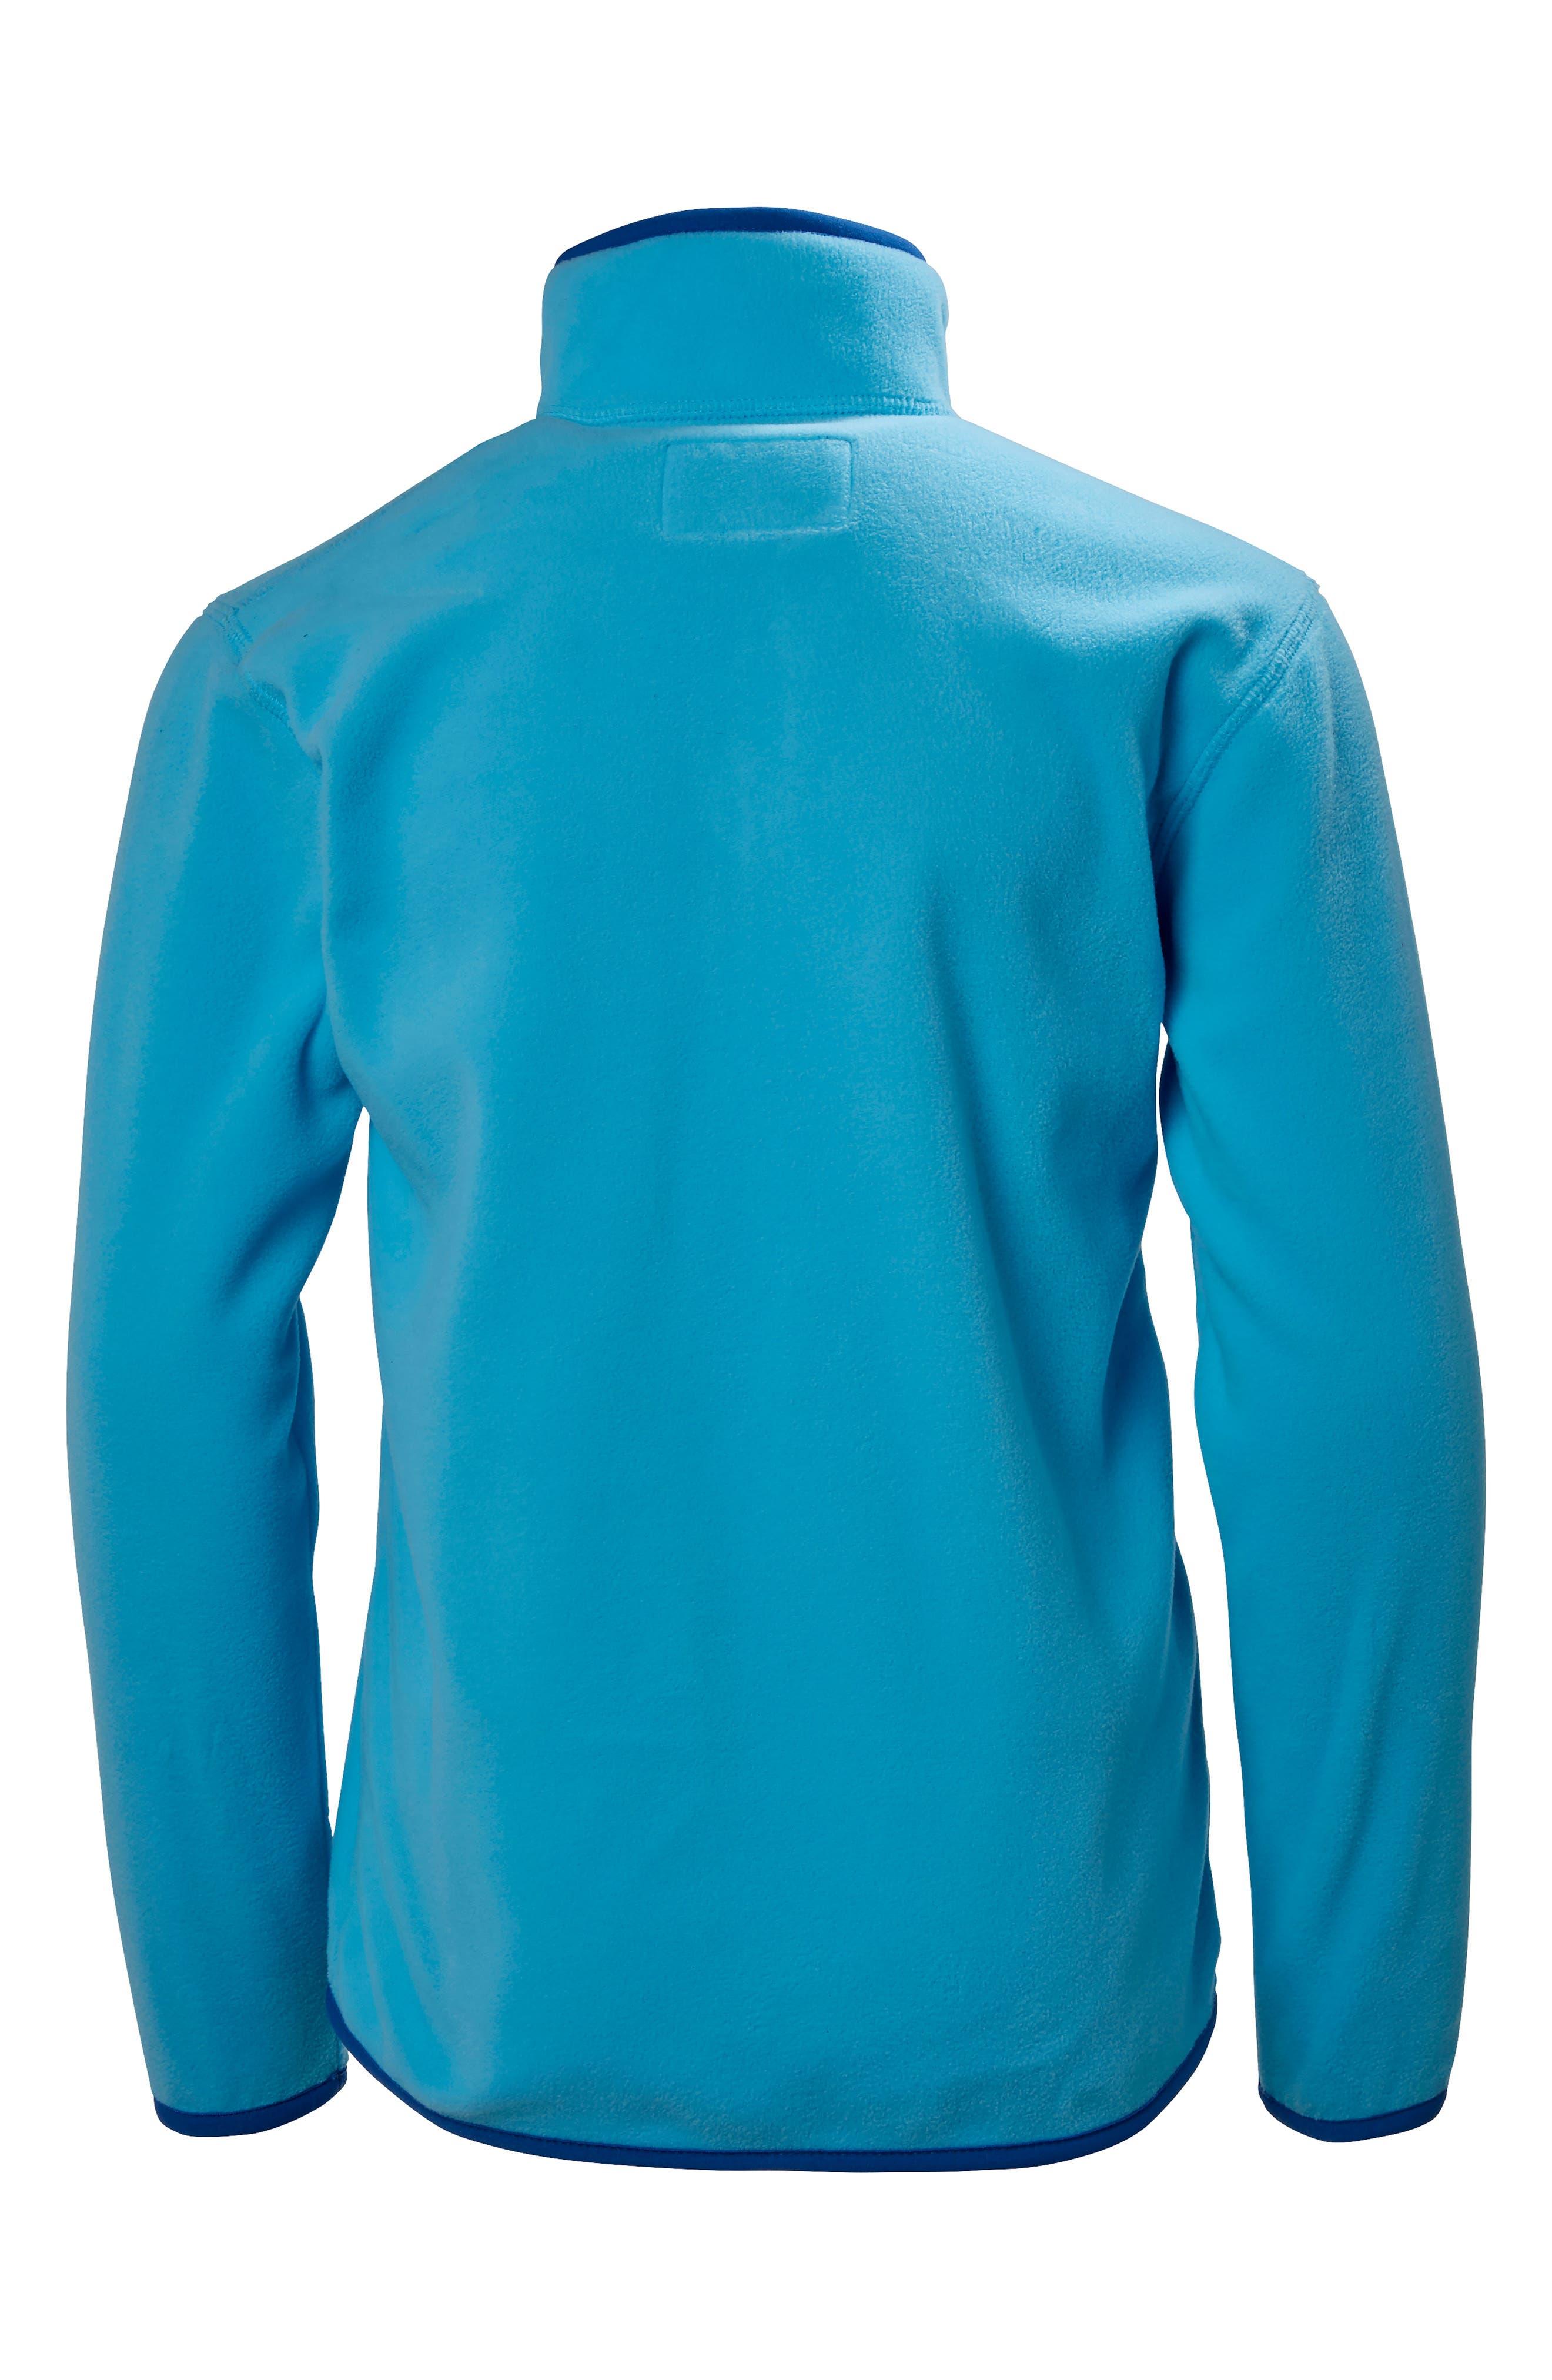 Jr. Daybreaker Polartec<sup>®</sup> Fleece Jacket,                             Alternate thumbnail 2, color,                             400